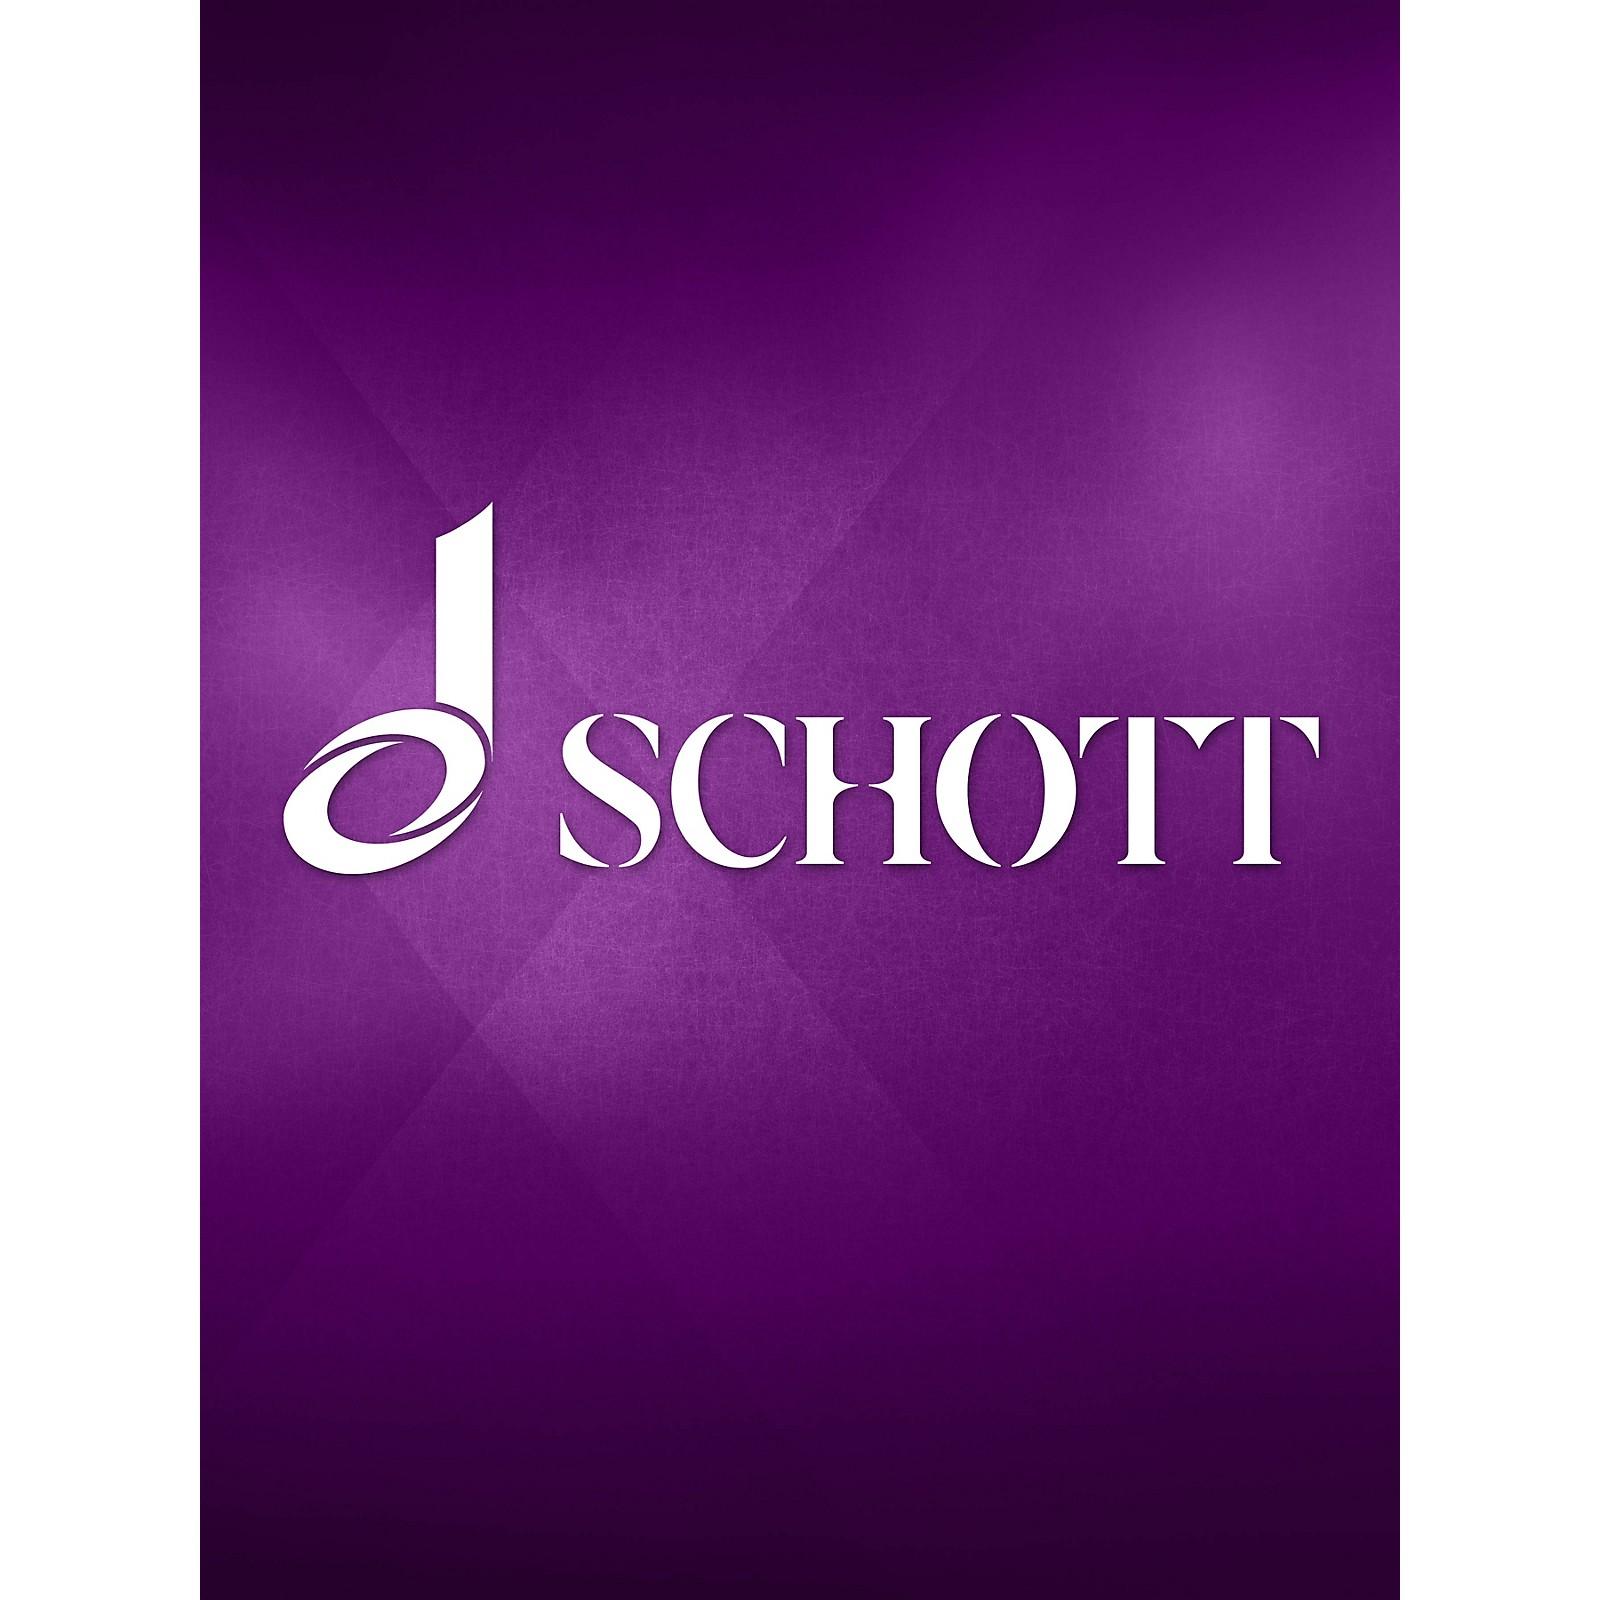 Schott Tales to Tell, Tales to Play Schott Series